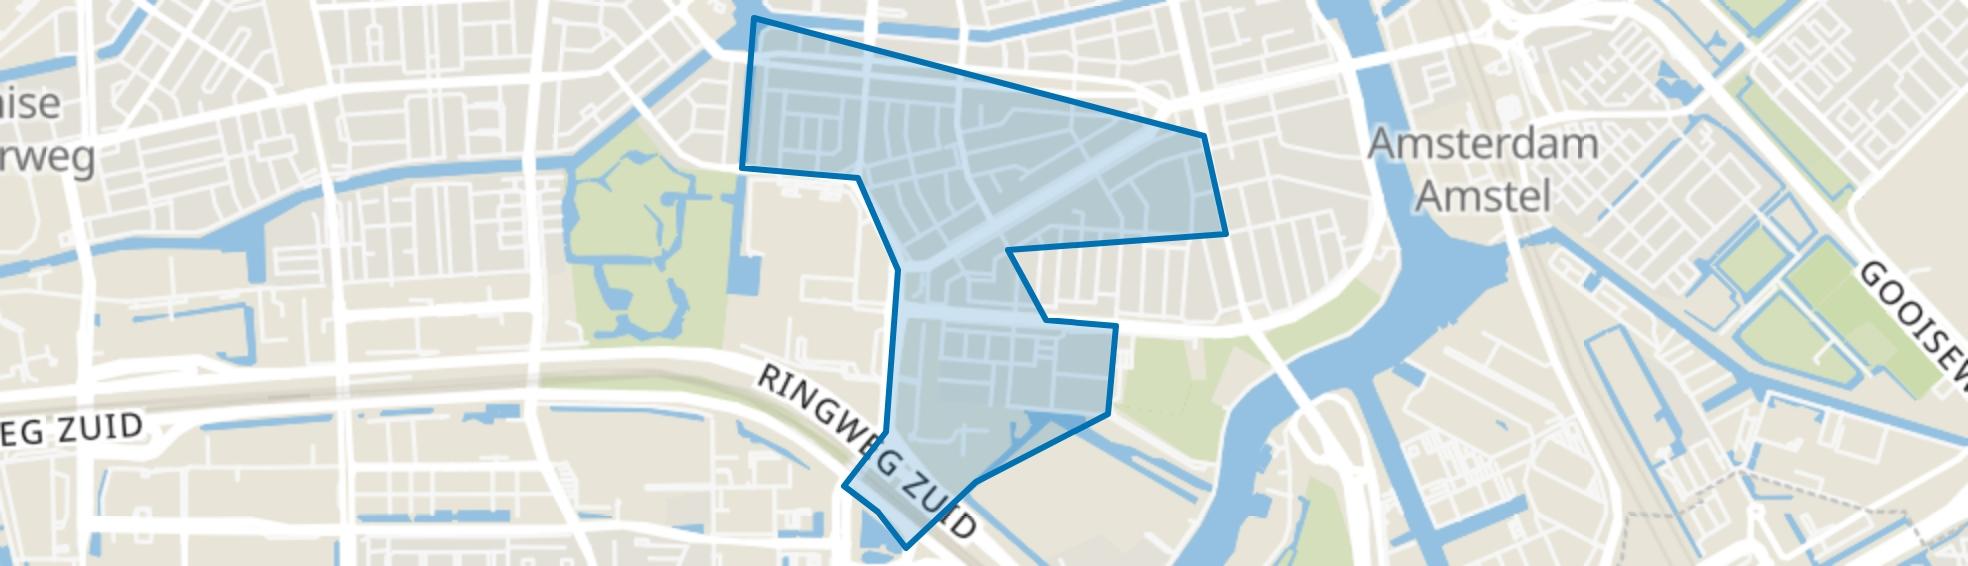 Scheldebuurt, Amsterdam map